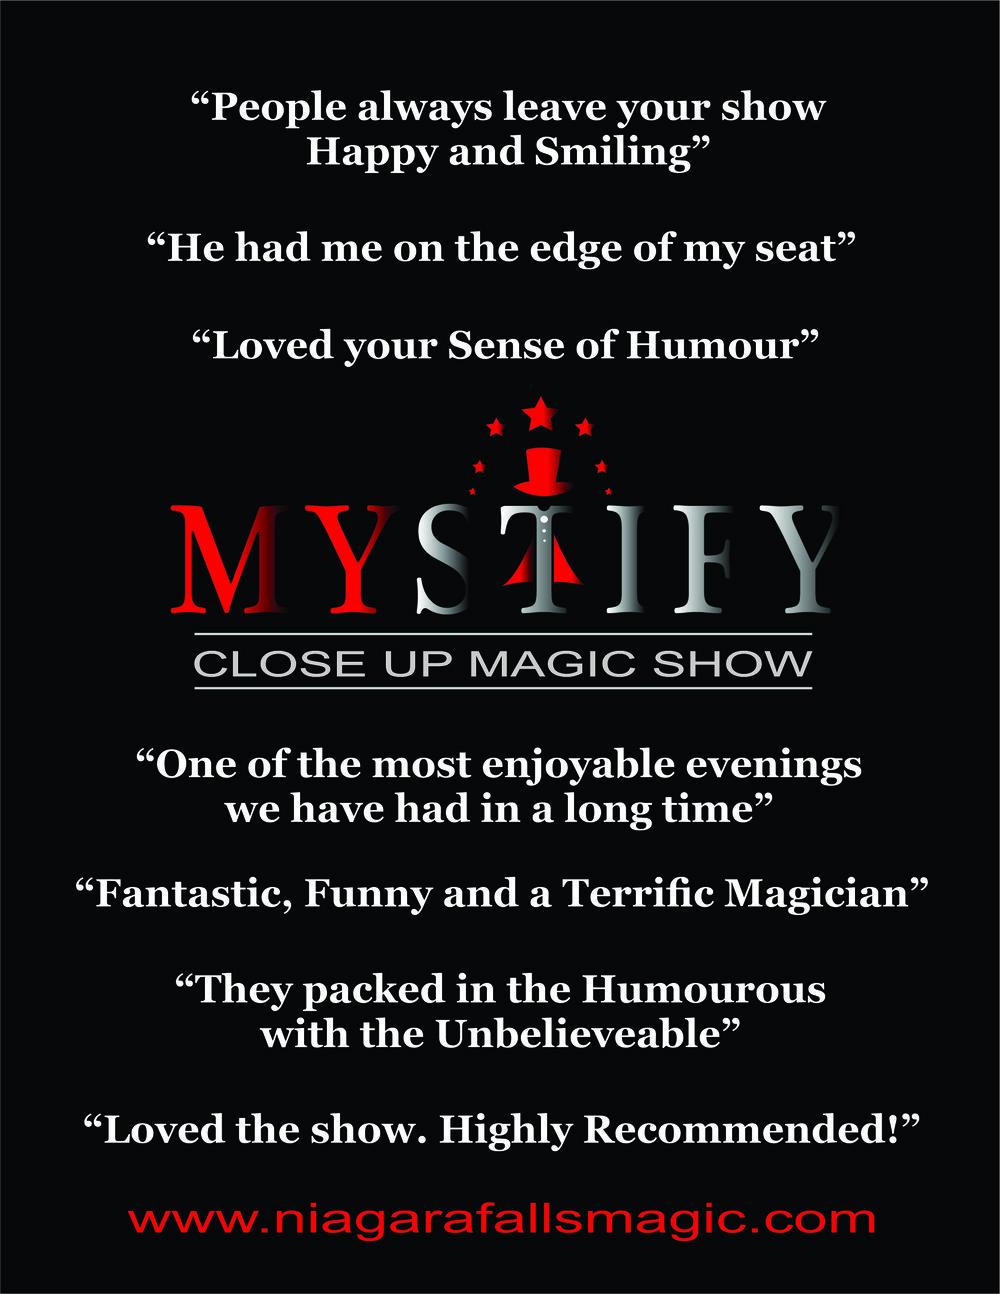 Mystify Magic Show Testimonials.JPG